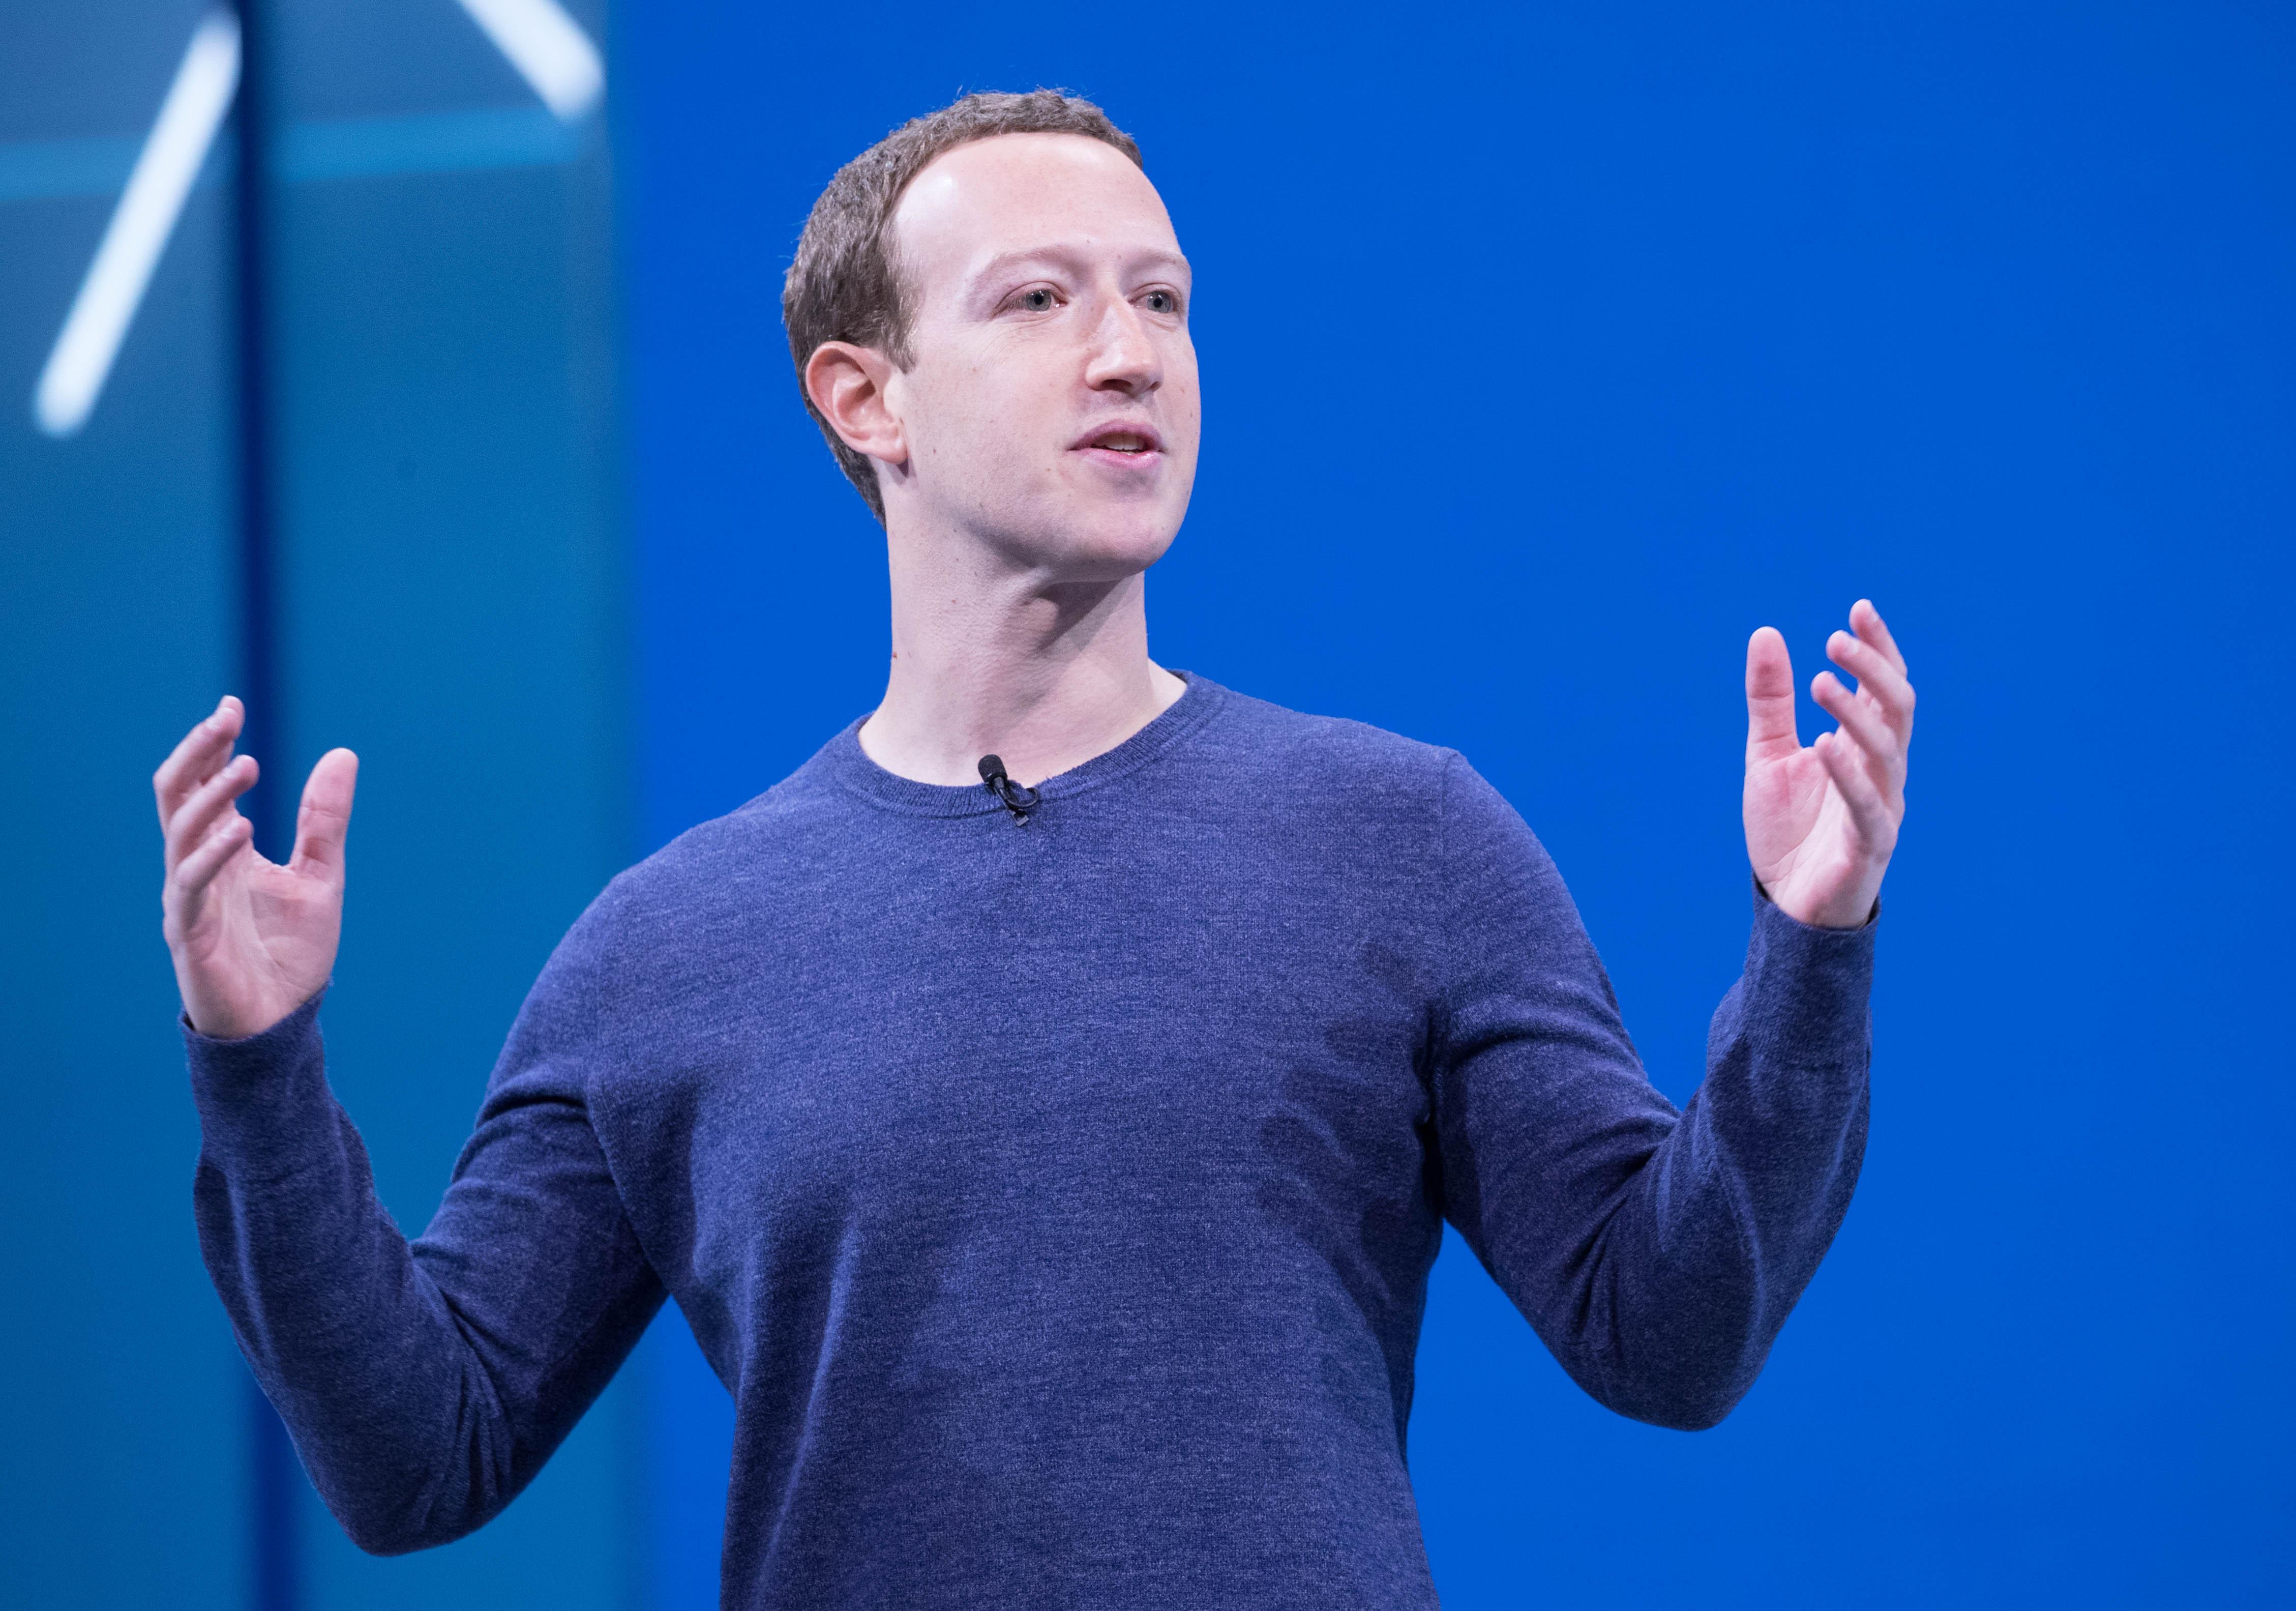 Súbor:Mark Zuckerberg F8 2018 Keynote (41118890874) jpg